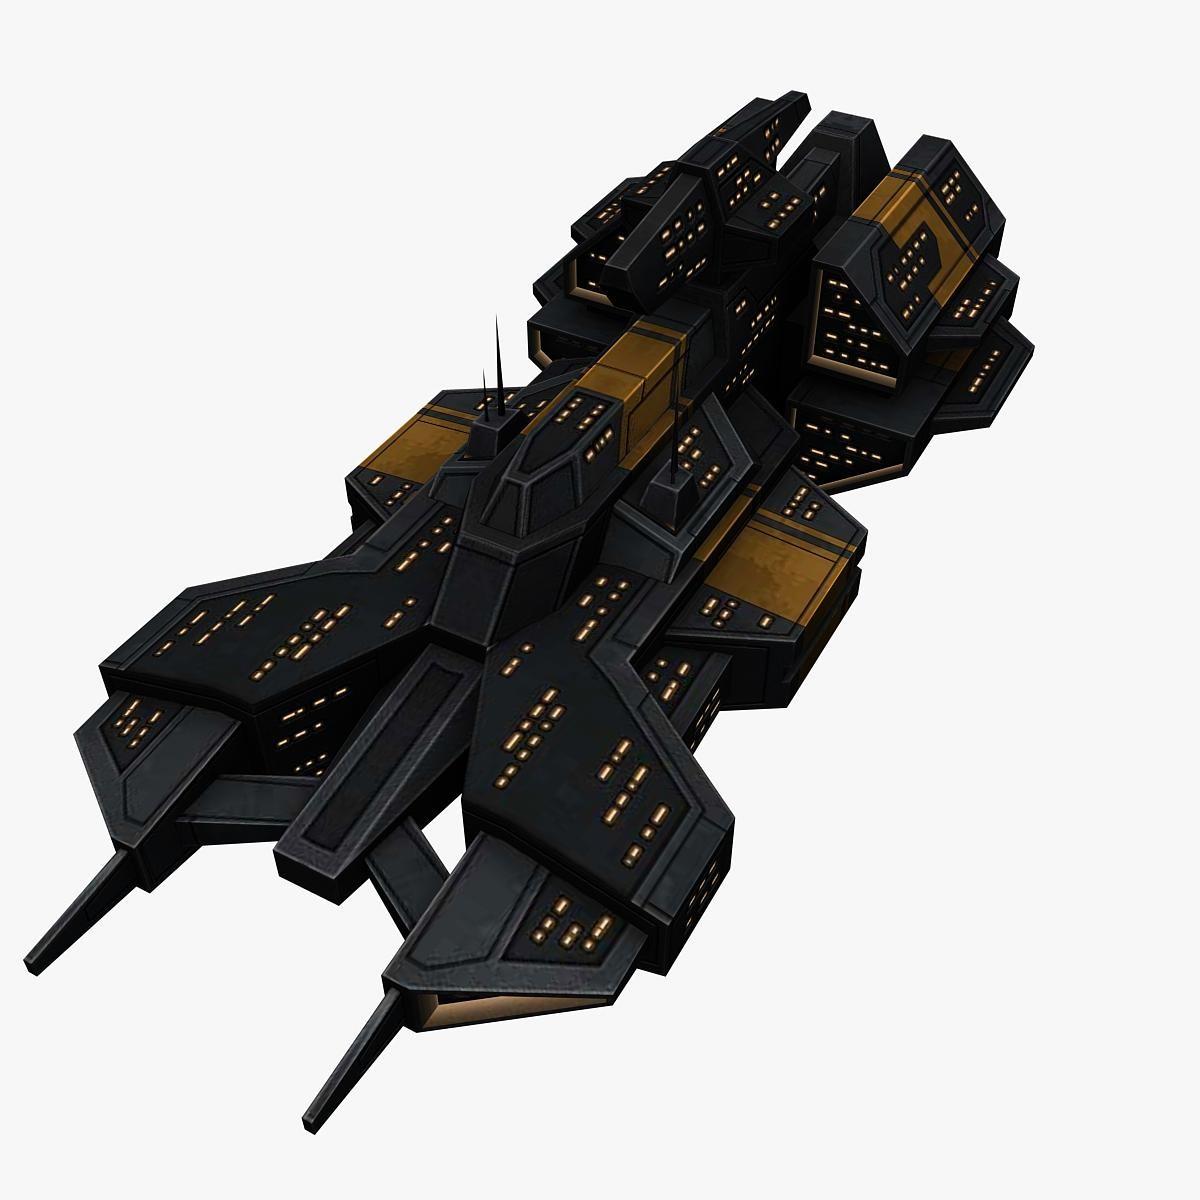 space_battleship_2_preview_0.jpg